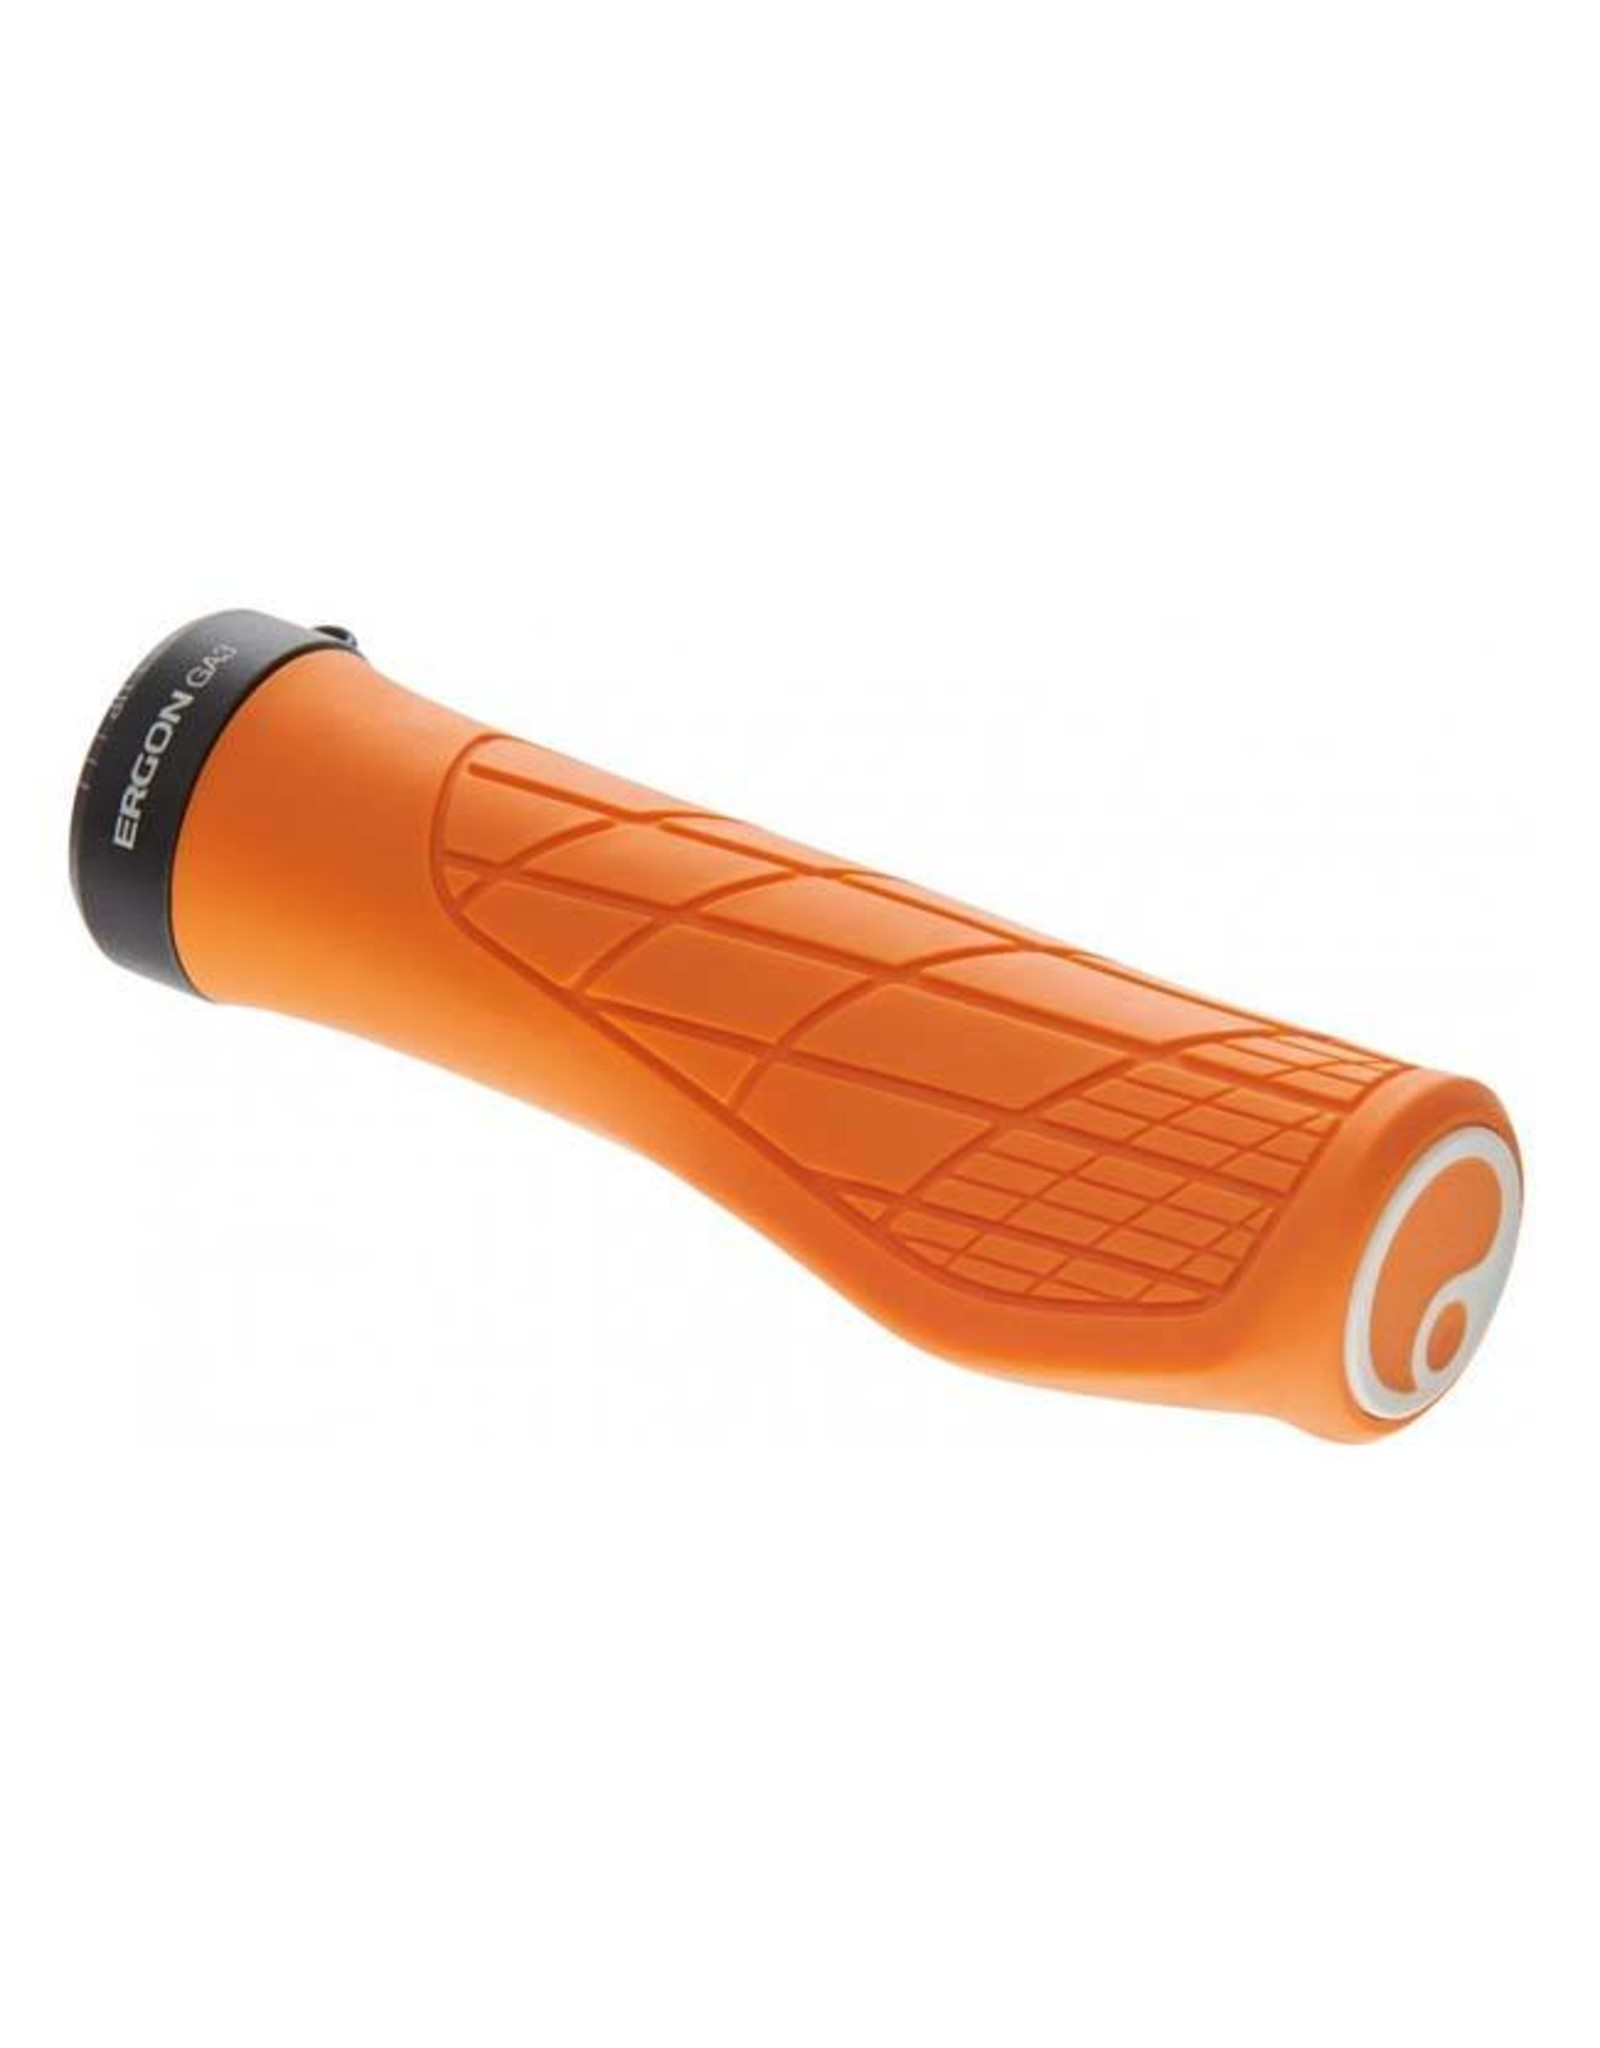 Ergon Ergon GA3 Gravity All Mountain Grips, Orange